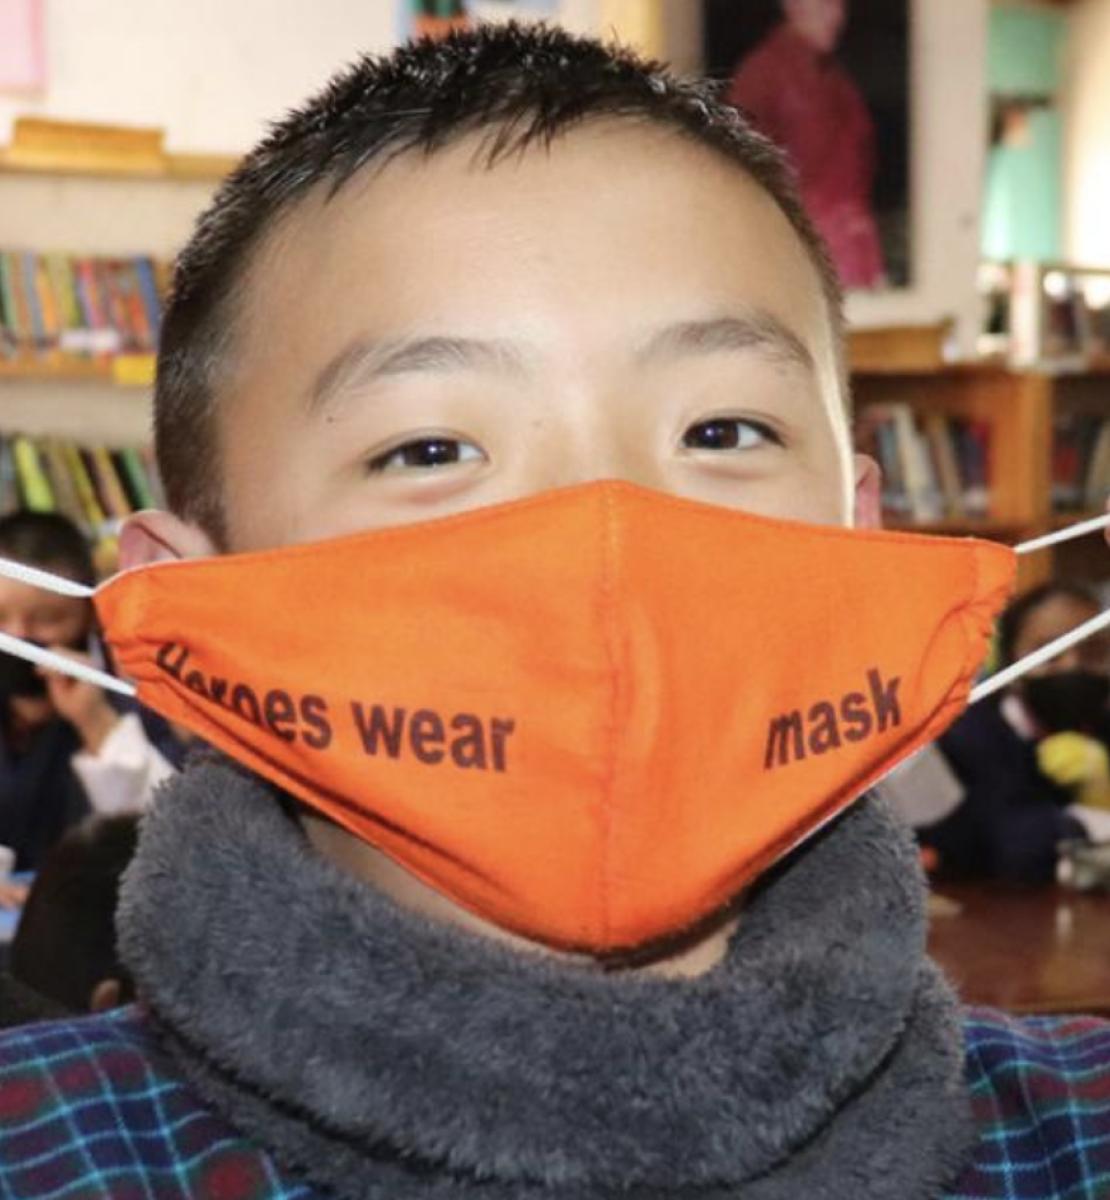 Un jeune garçon enfile un masque de protection orange en regardant en direction de la caméra.